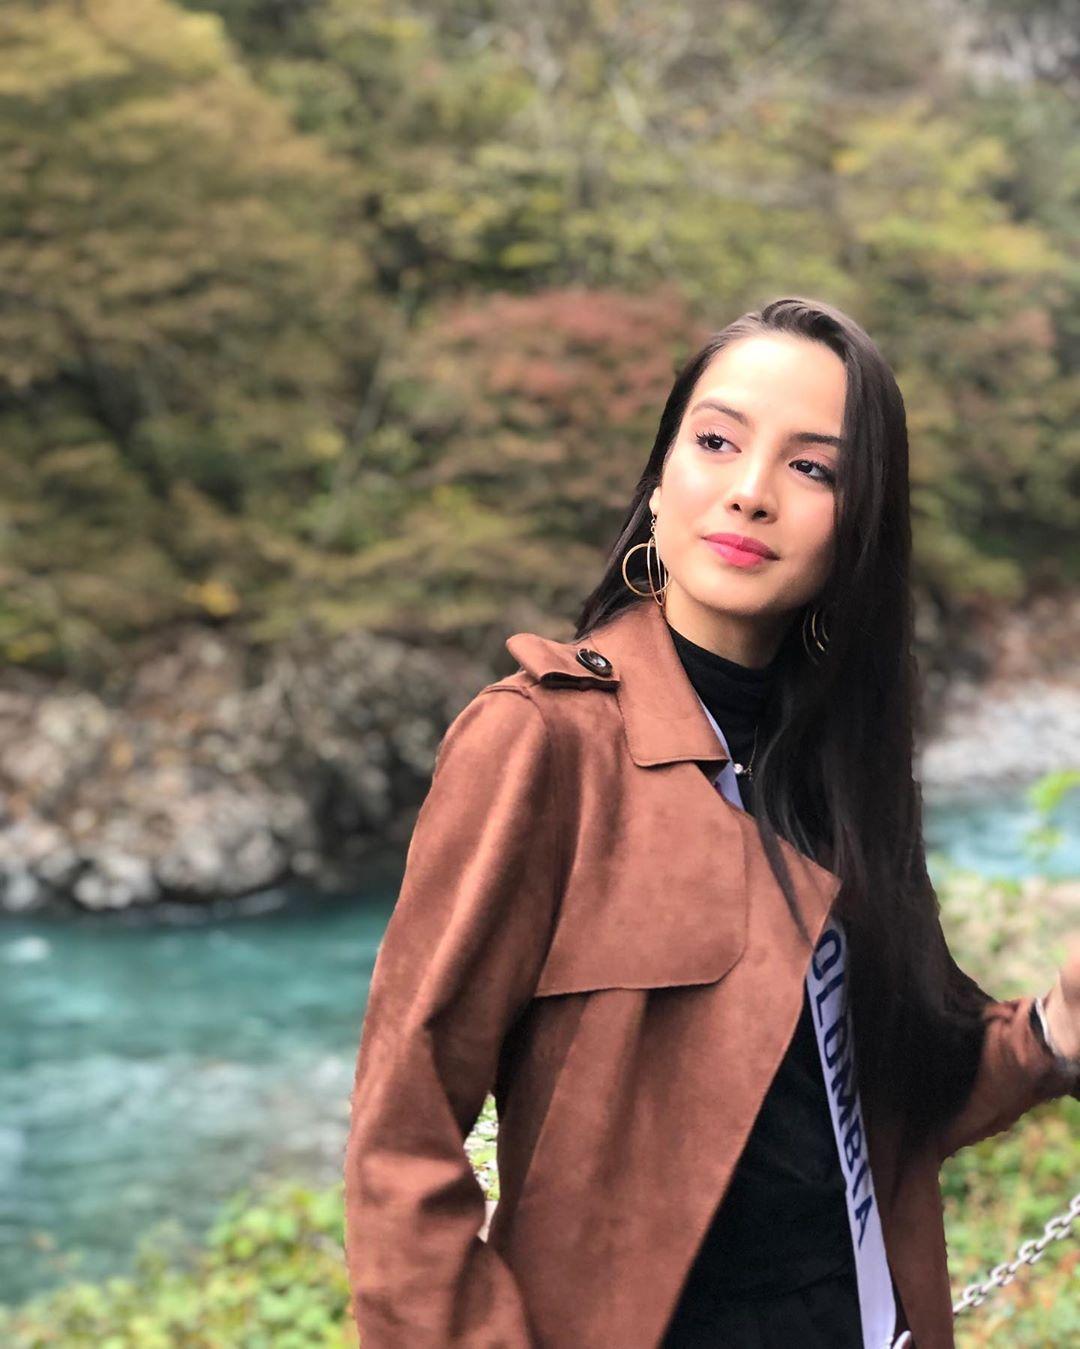 maria alejandra vengoechea, miss colombia hispanoamericana 2021/3rd runner-up de miss international 2019. - Página 5 75207310